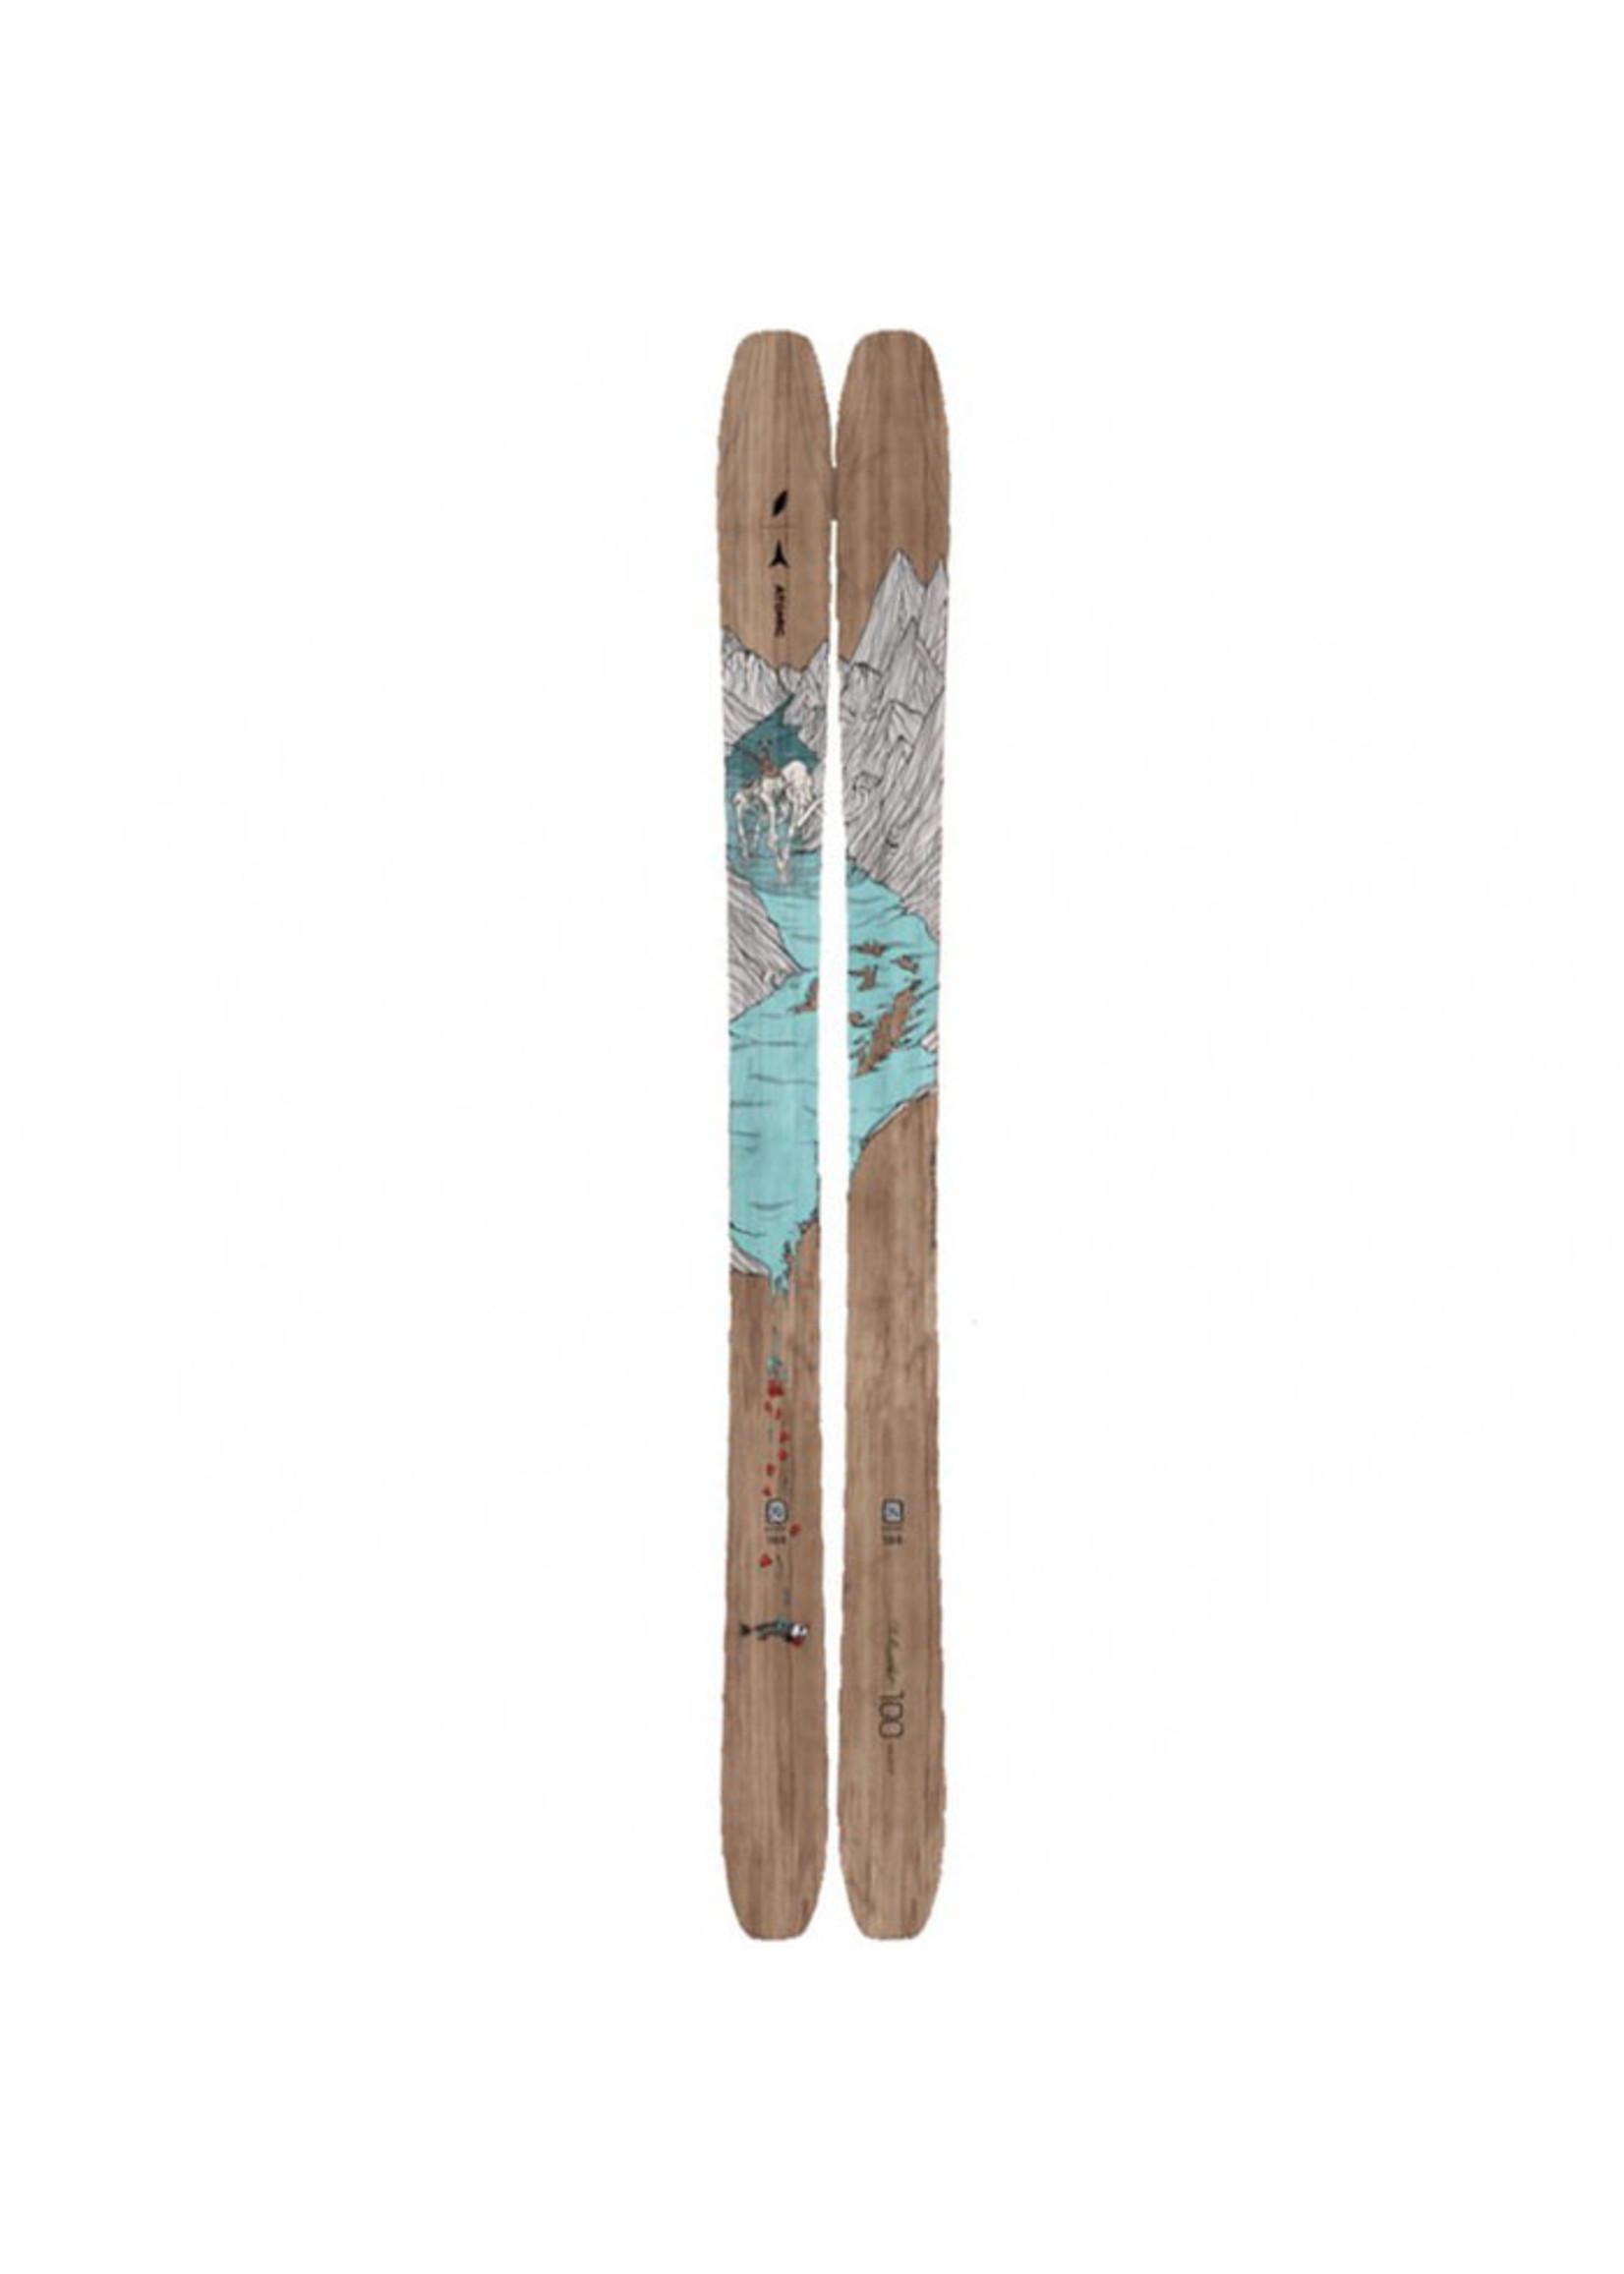 Atomic Alpine Ski Bent Chetler 100 Grateful Dead Edition